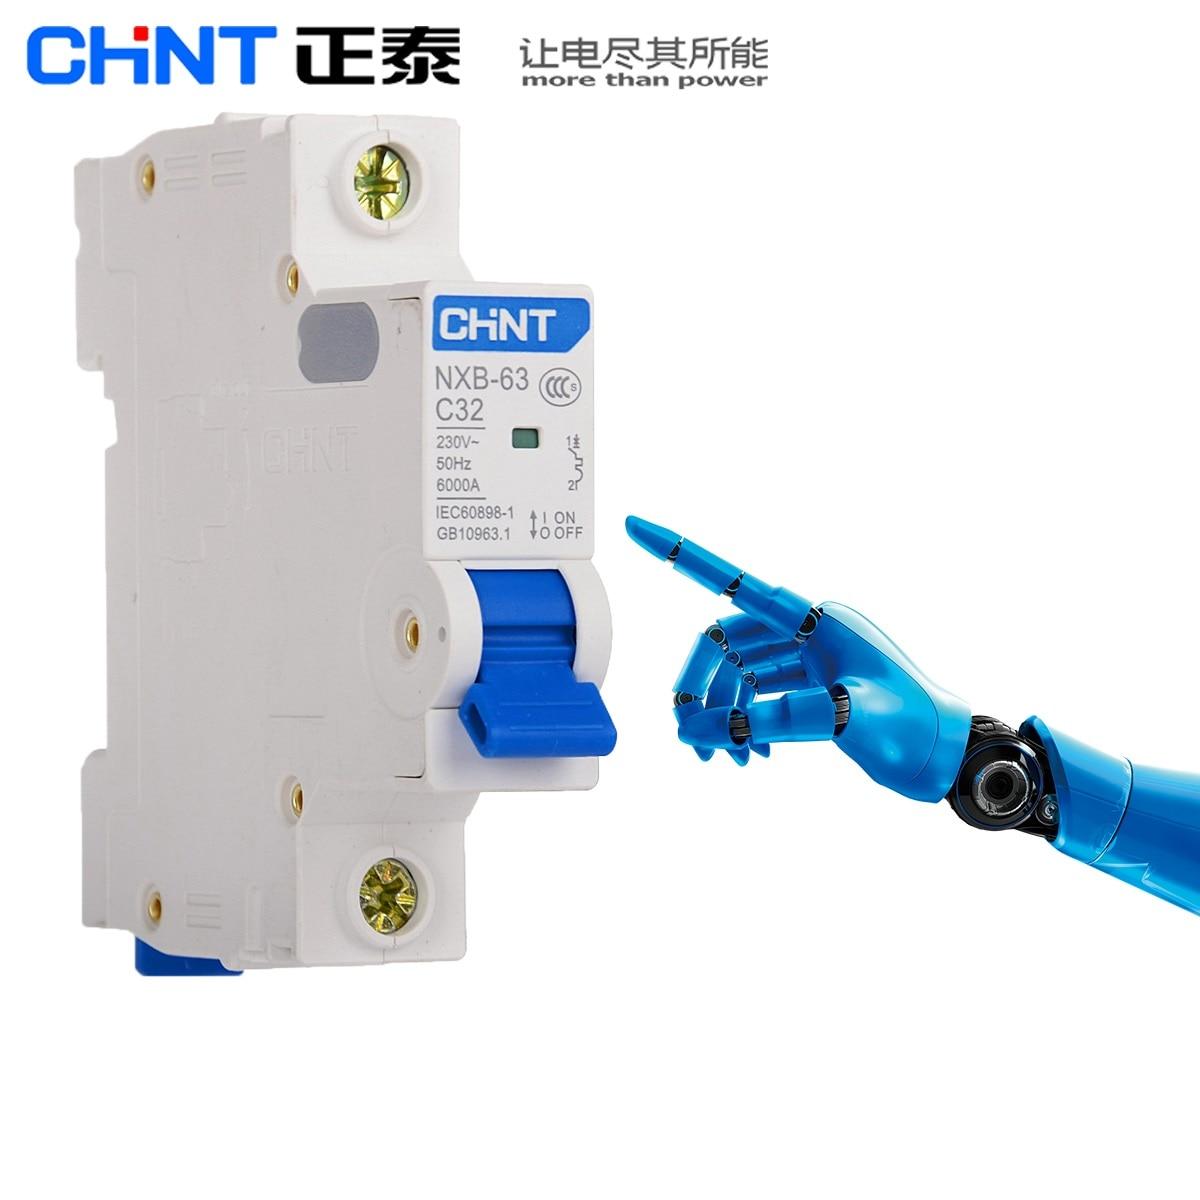 CHINT NXB-63 1A 2A 3A 6A 10A 16A 20A 25A 32A 40A 63A 1P 2P 3P 4P 230V 220V Miniature Circuit breaker MCB NEW DZ47